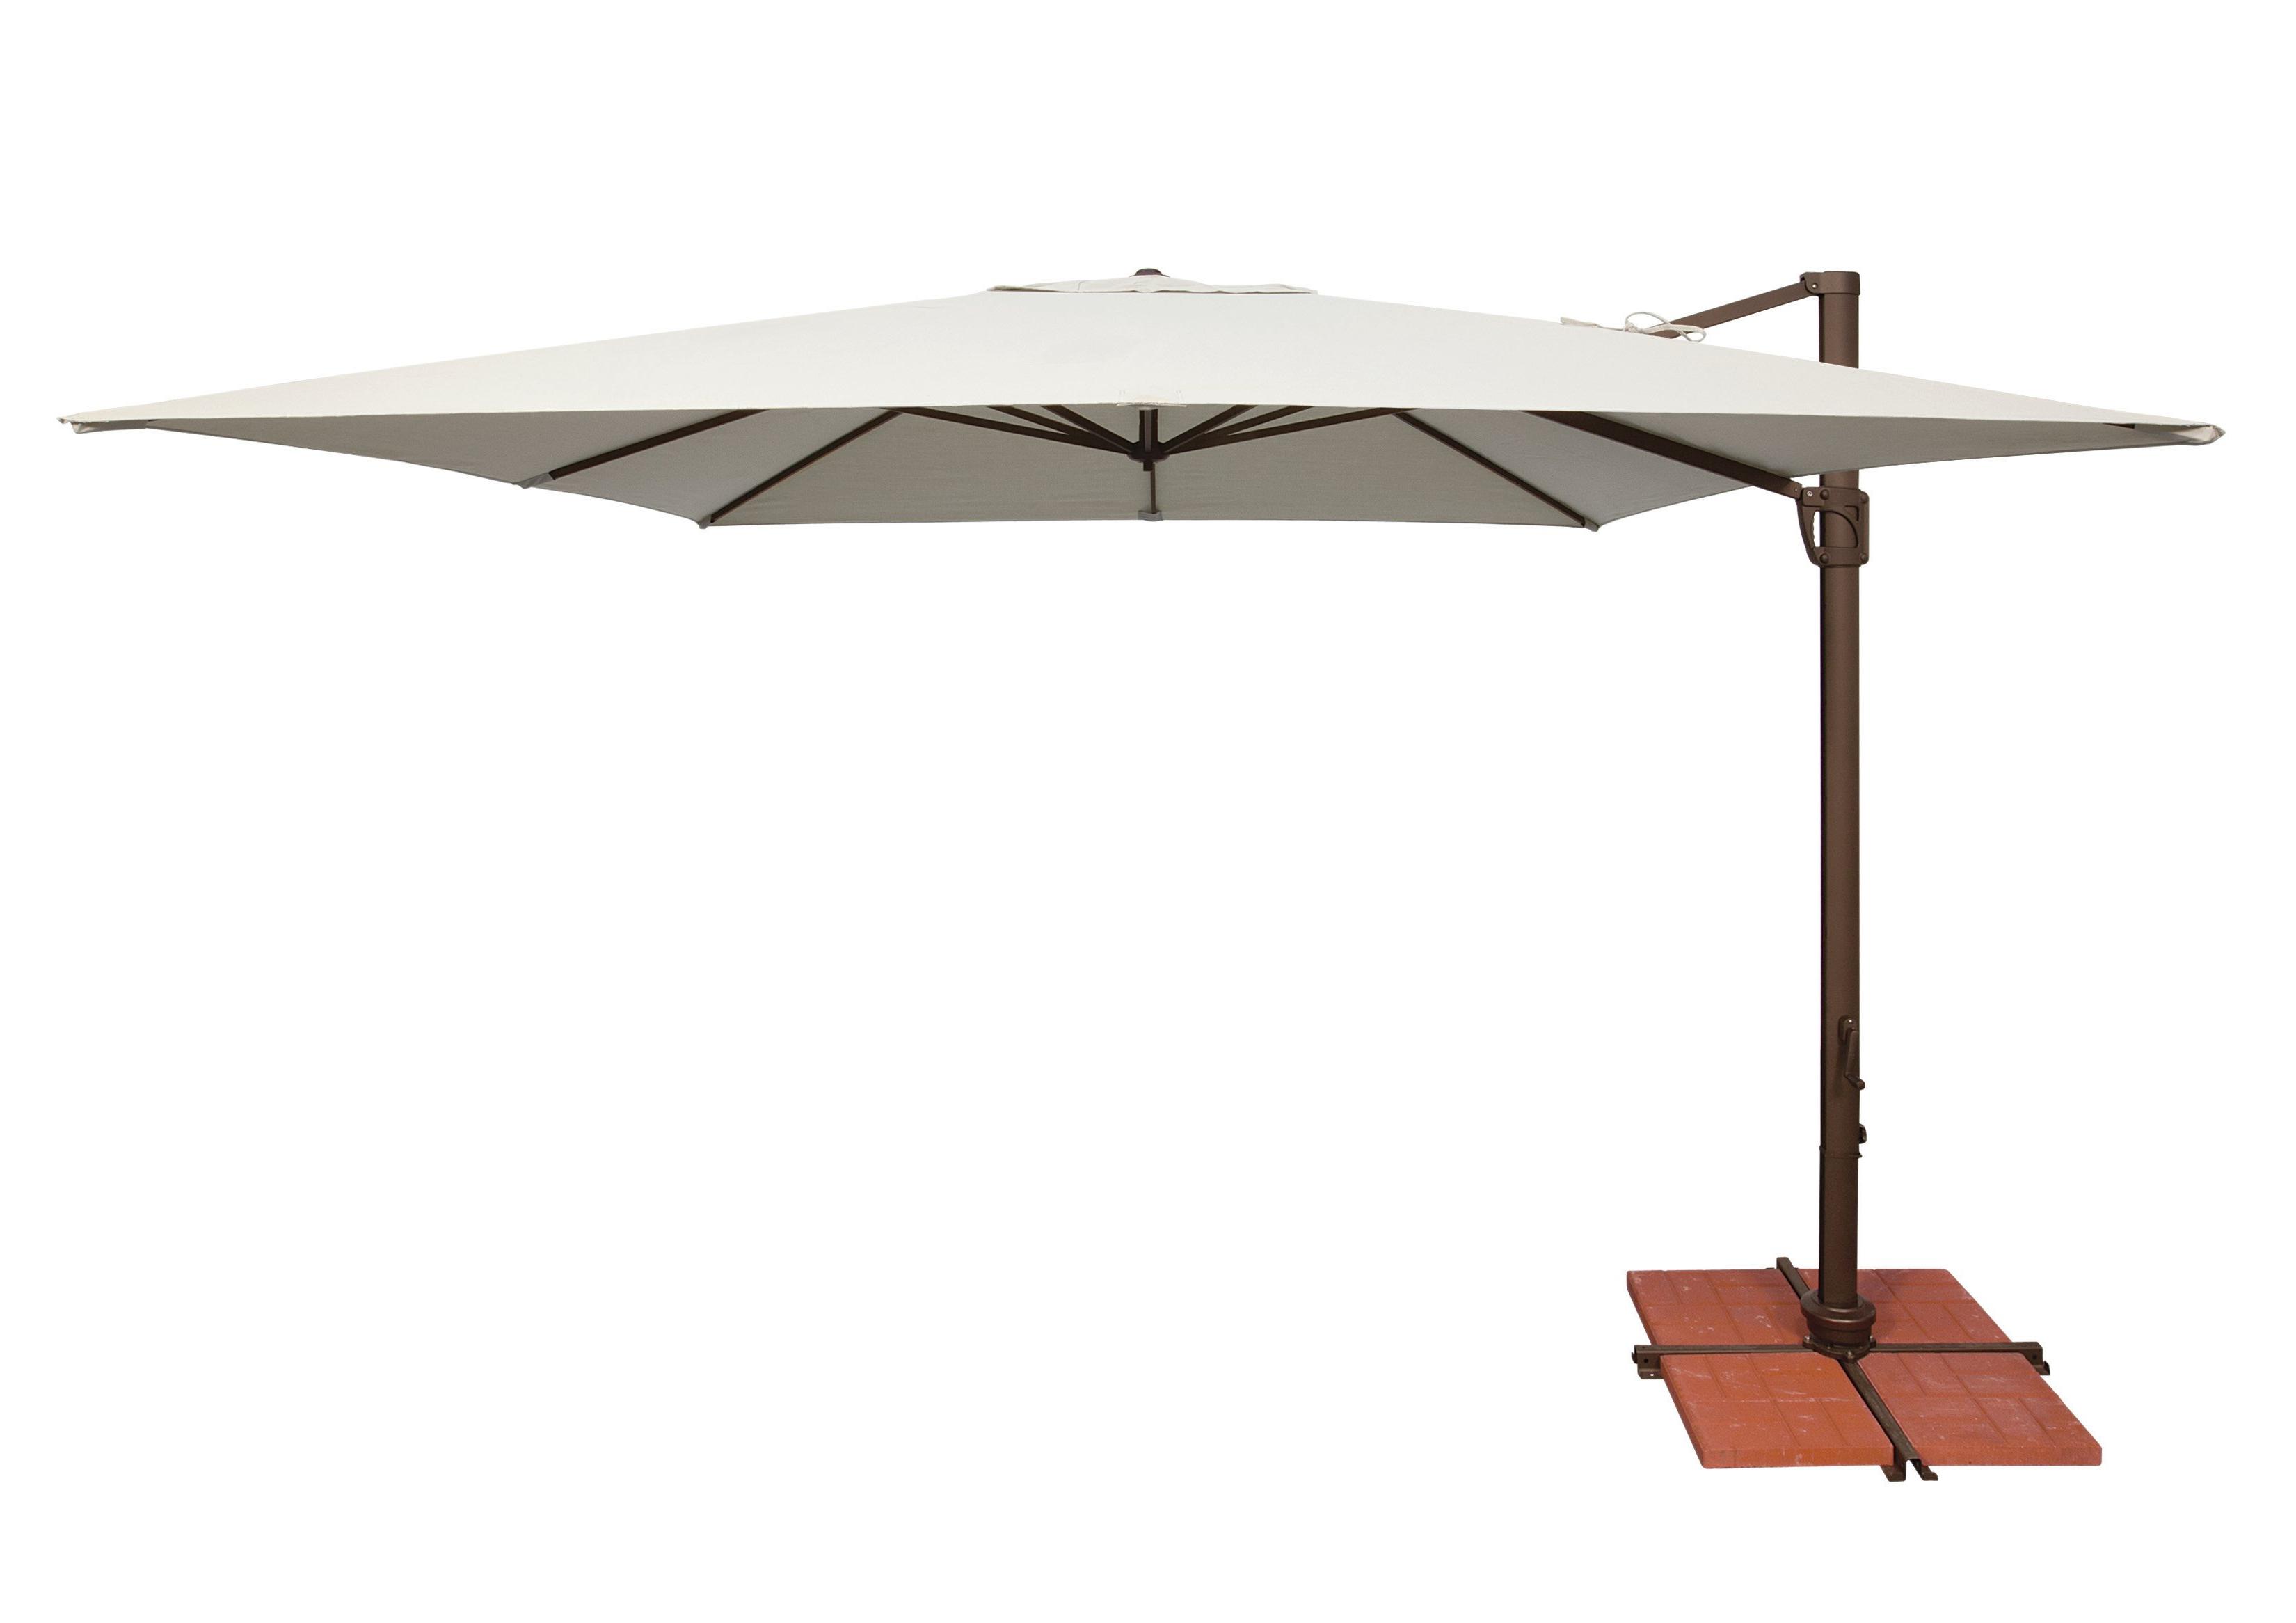 Trendy Gemmenne Square Cantilever Umbrellas For Windell 10' Square Cantilever Umbrella (View 6 of 20)